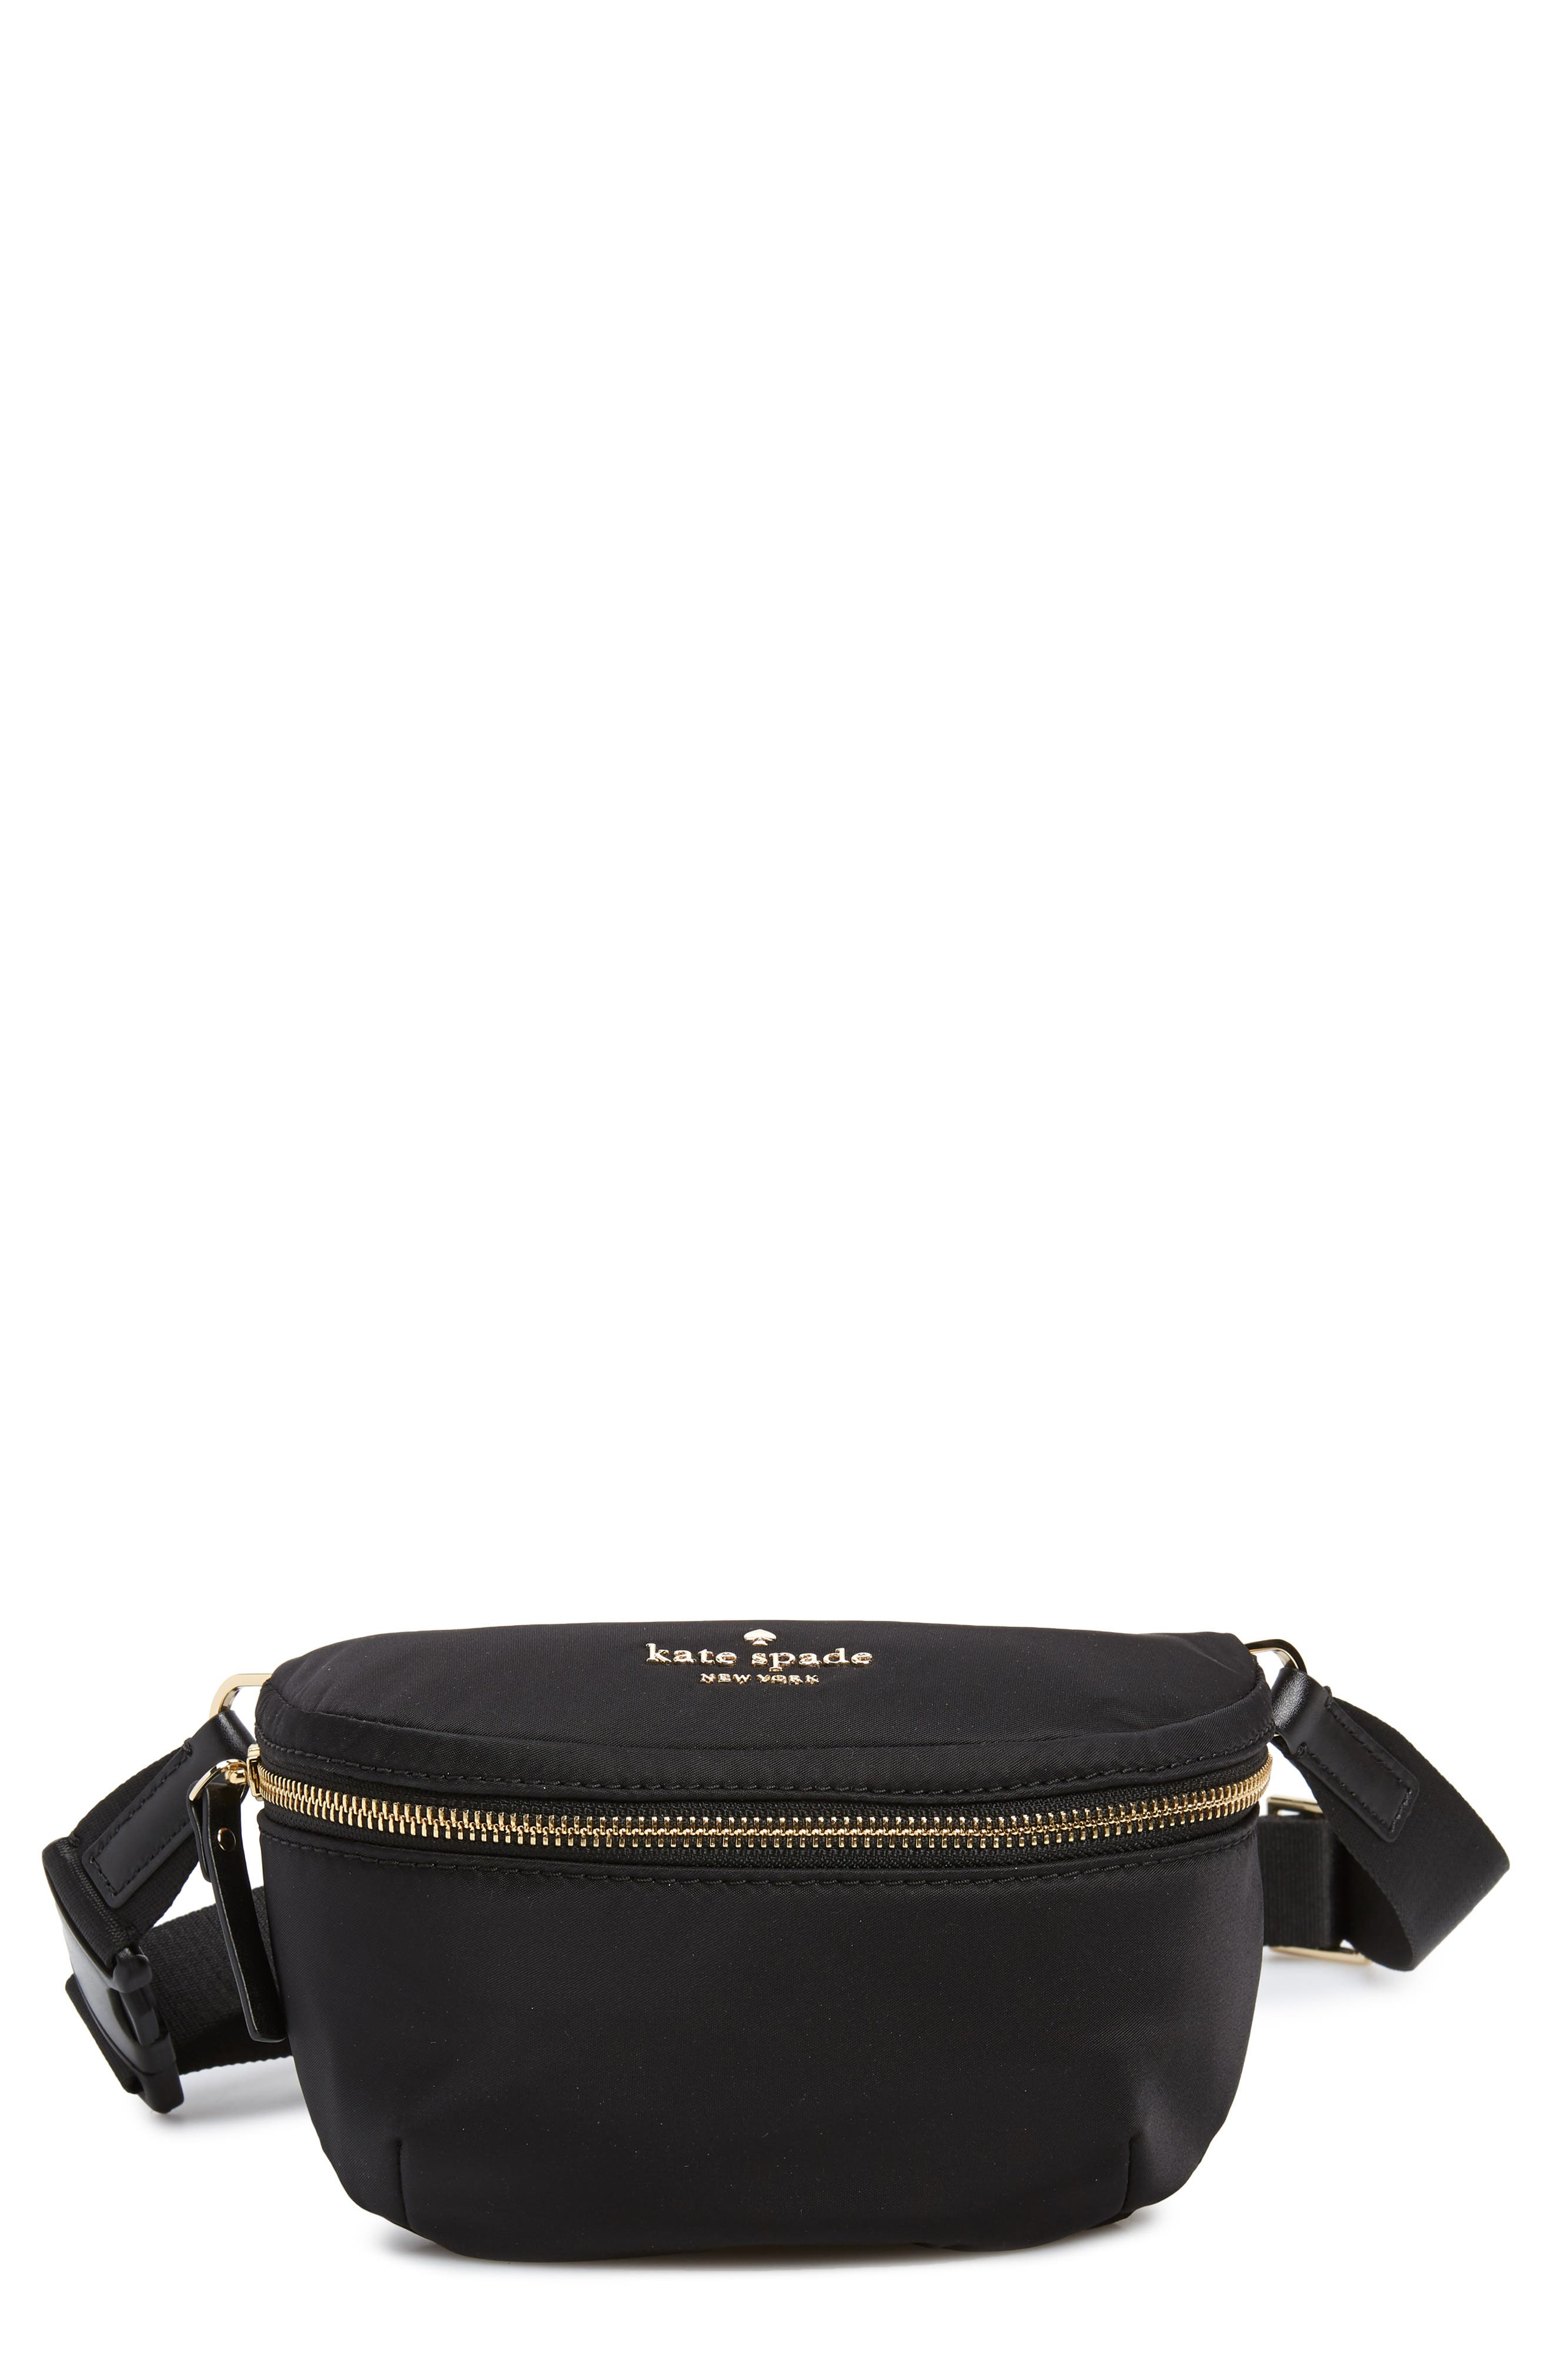 Kate Spade New York Crossbody Bags  5804b09dae191